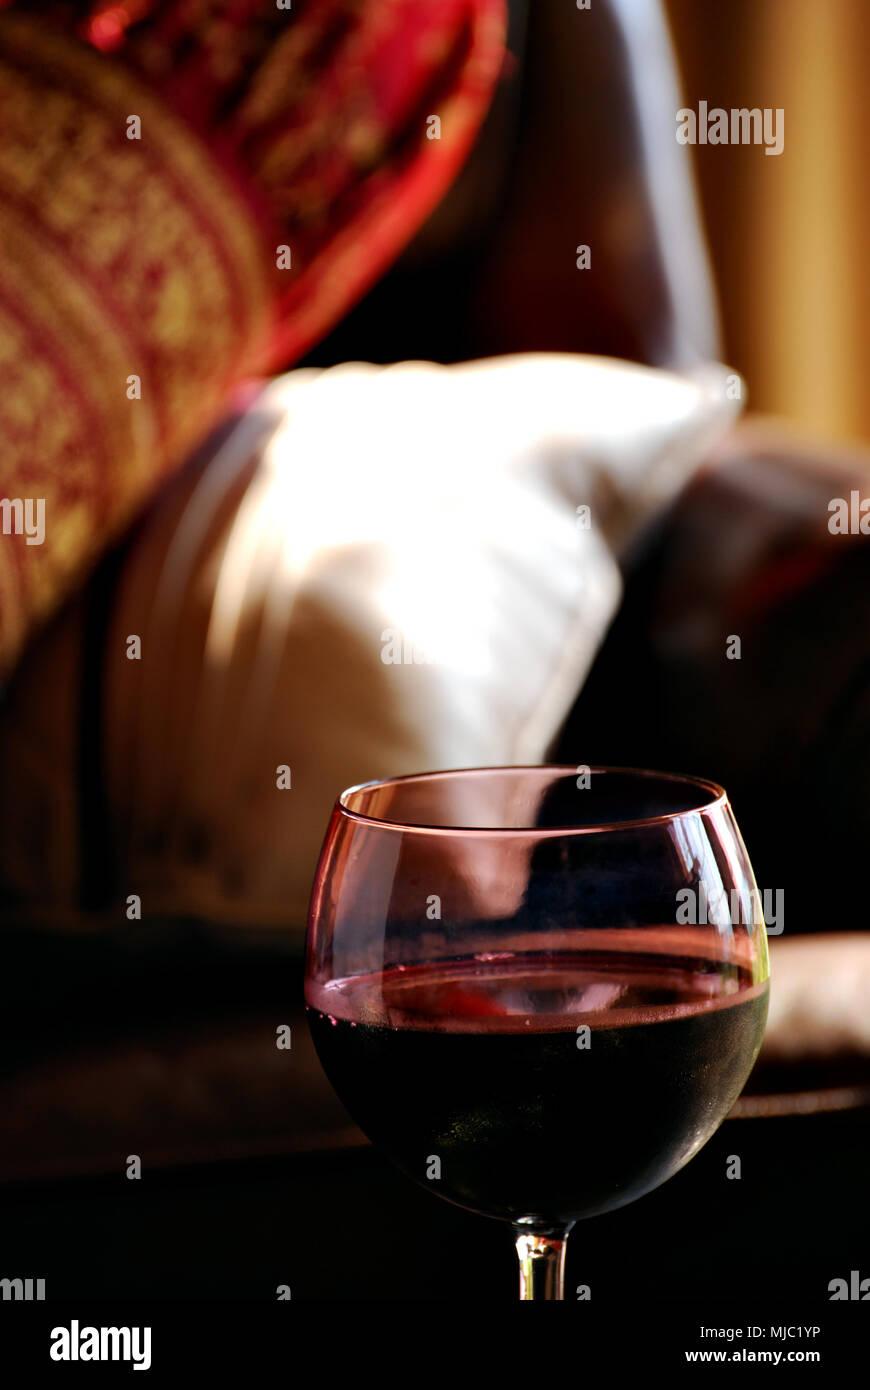 Rotwein Auf Dem Messing Platte Mit Leder Stuhl Stockfoto Bild